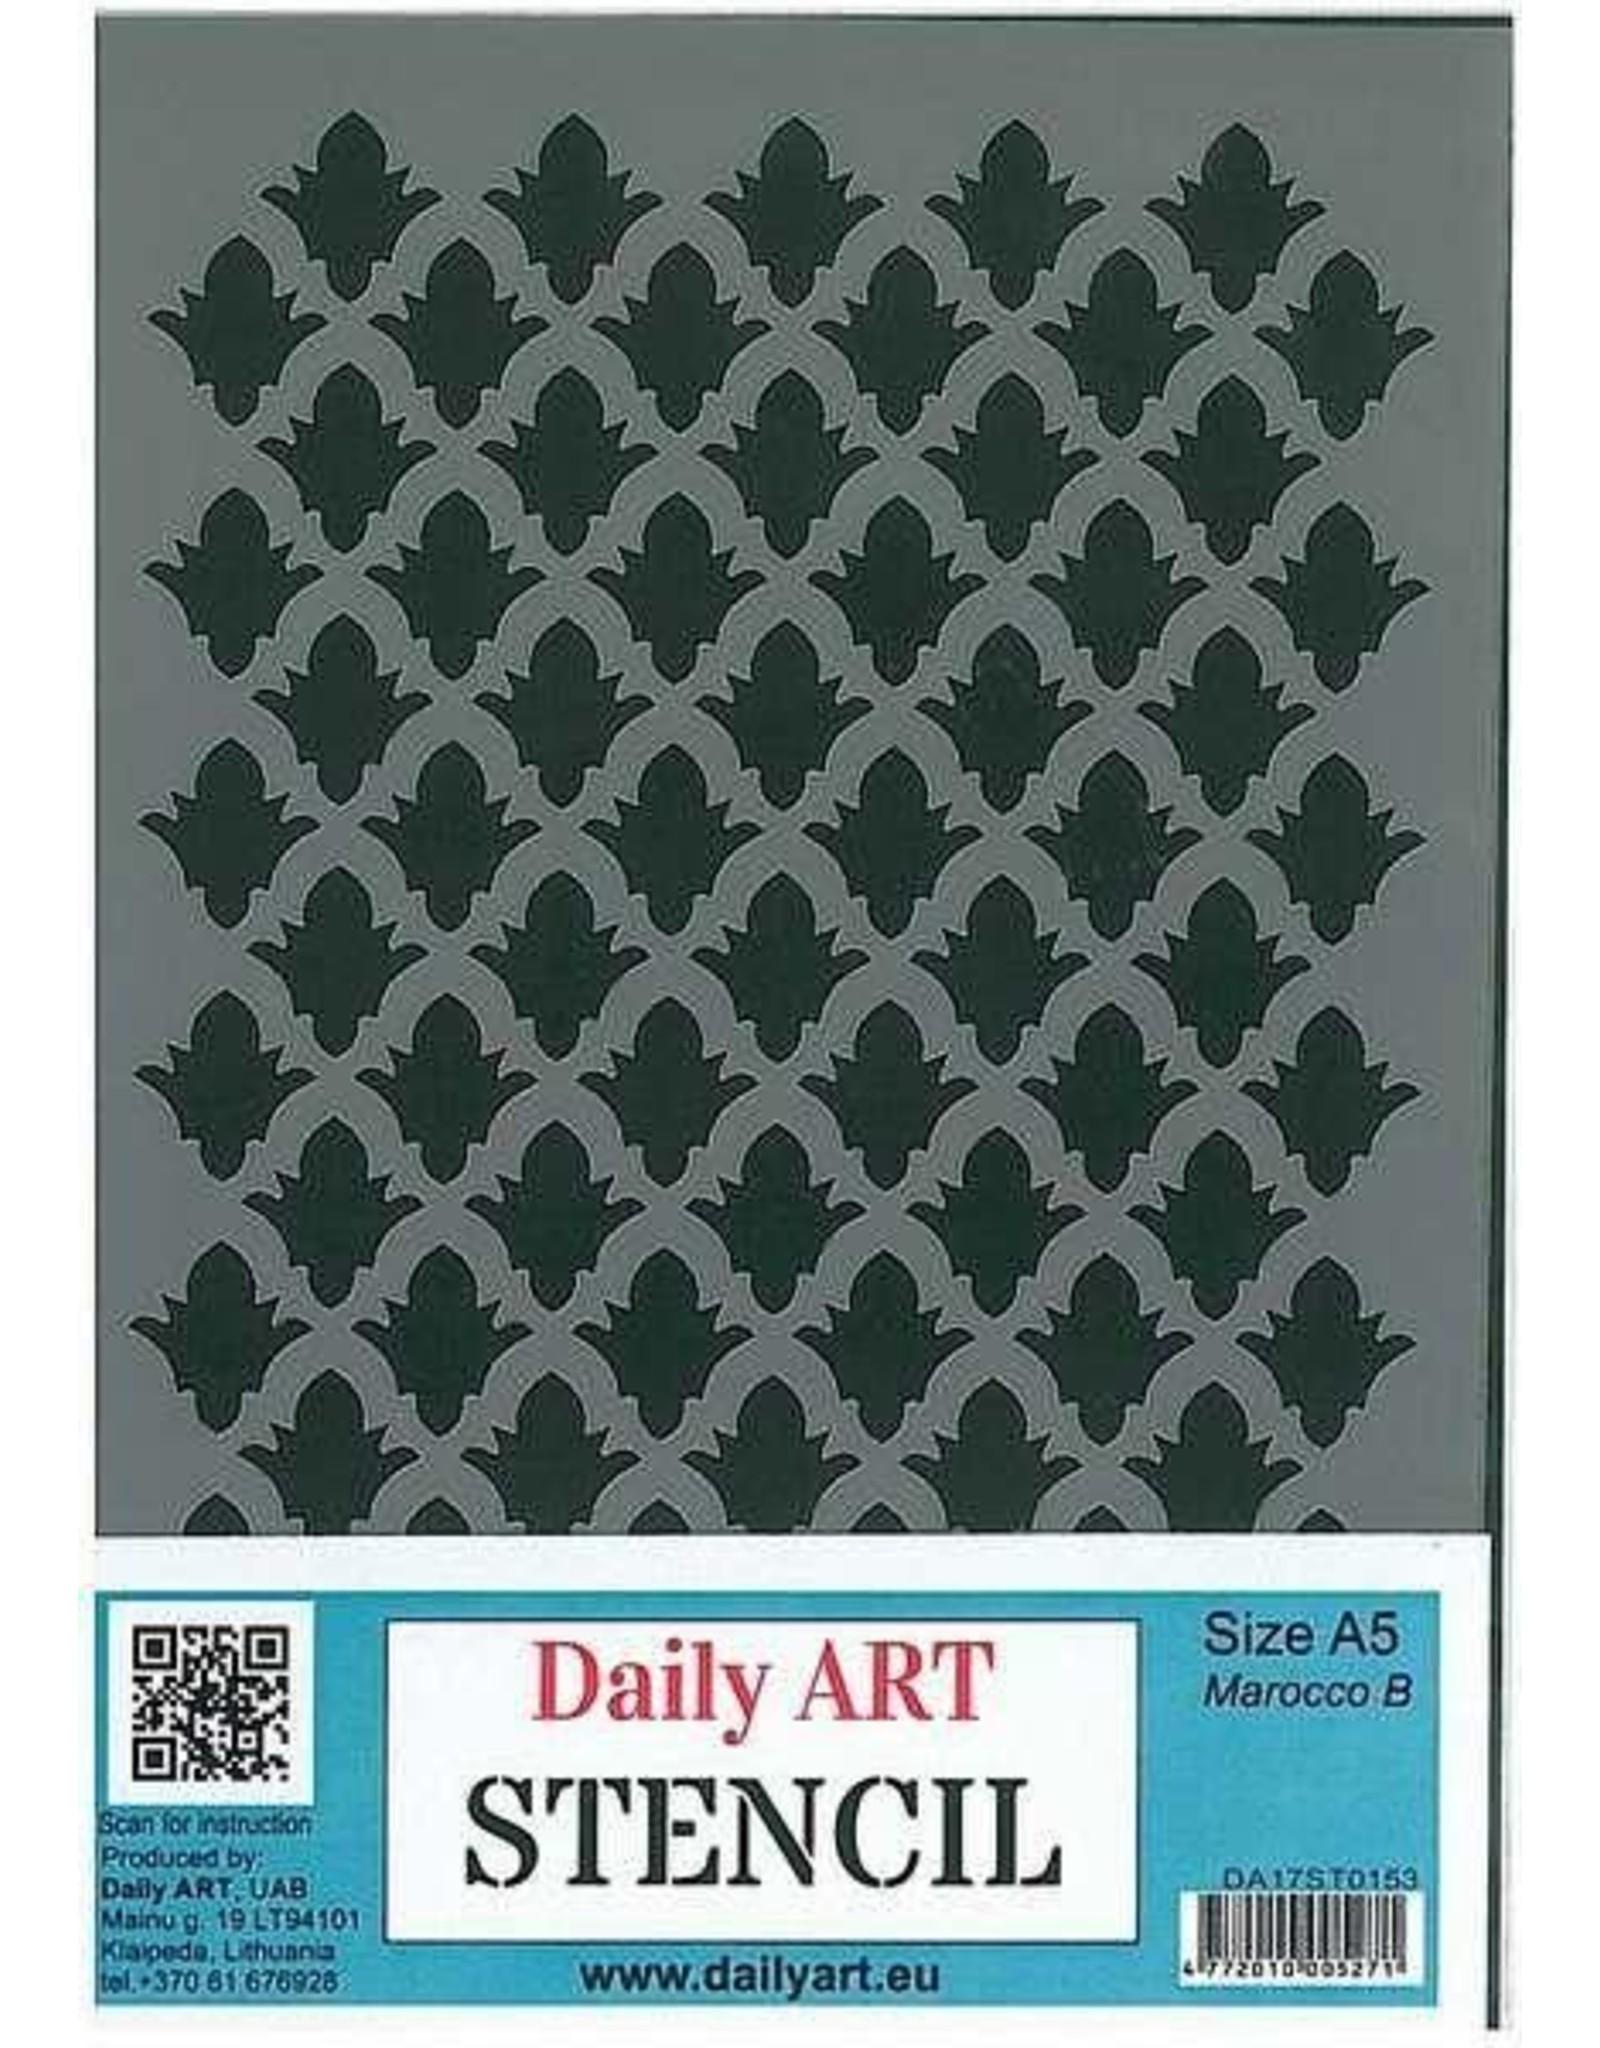 daily art Daily Art mask stencil Marocco B A5